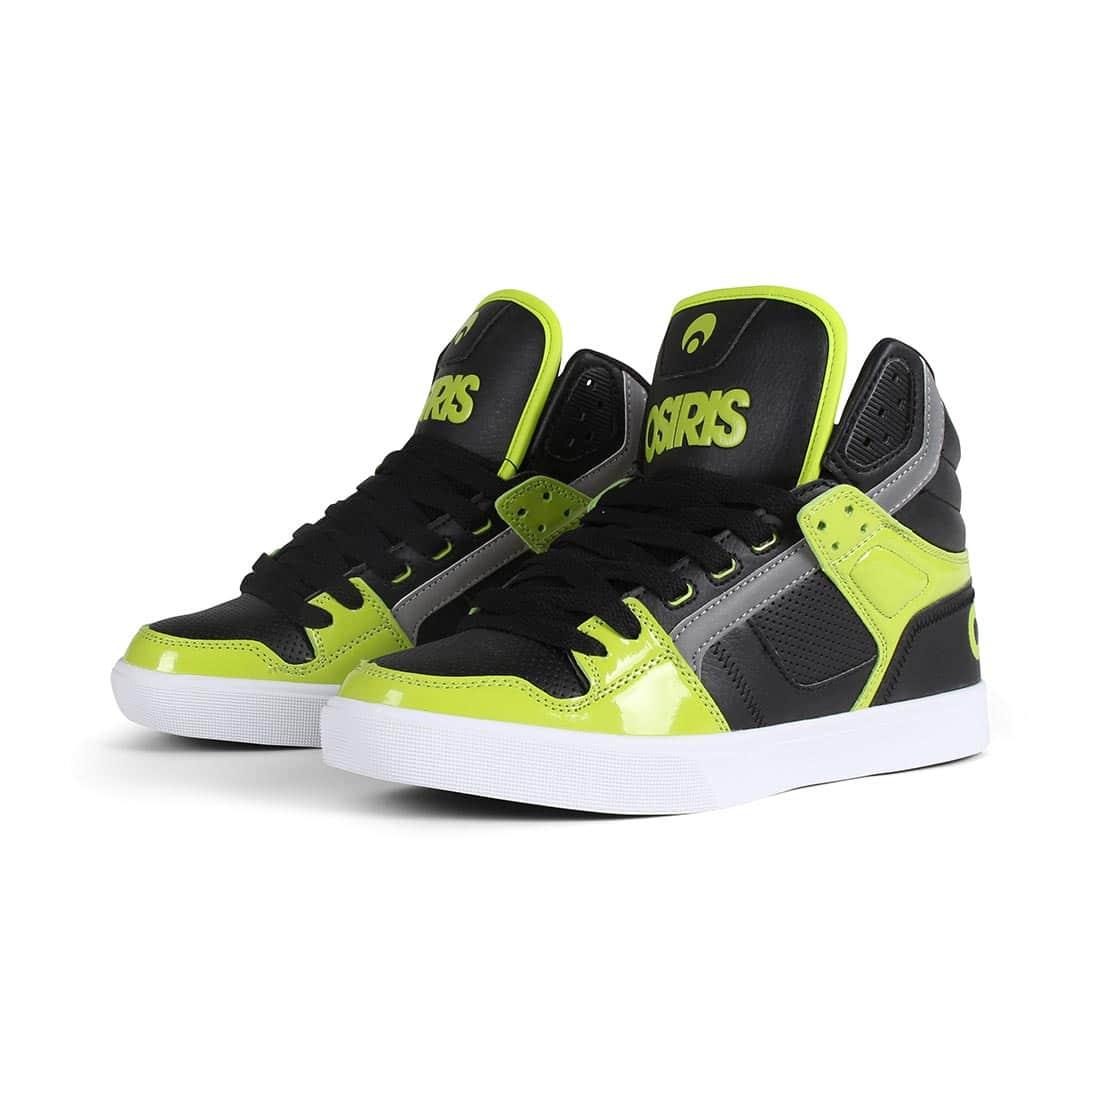 Osiris Clone High Top Shoes - Lime / Black / White